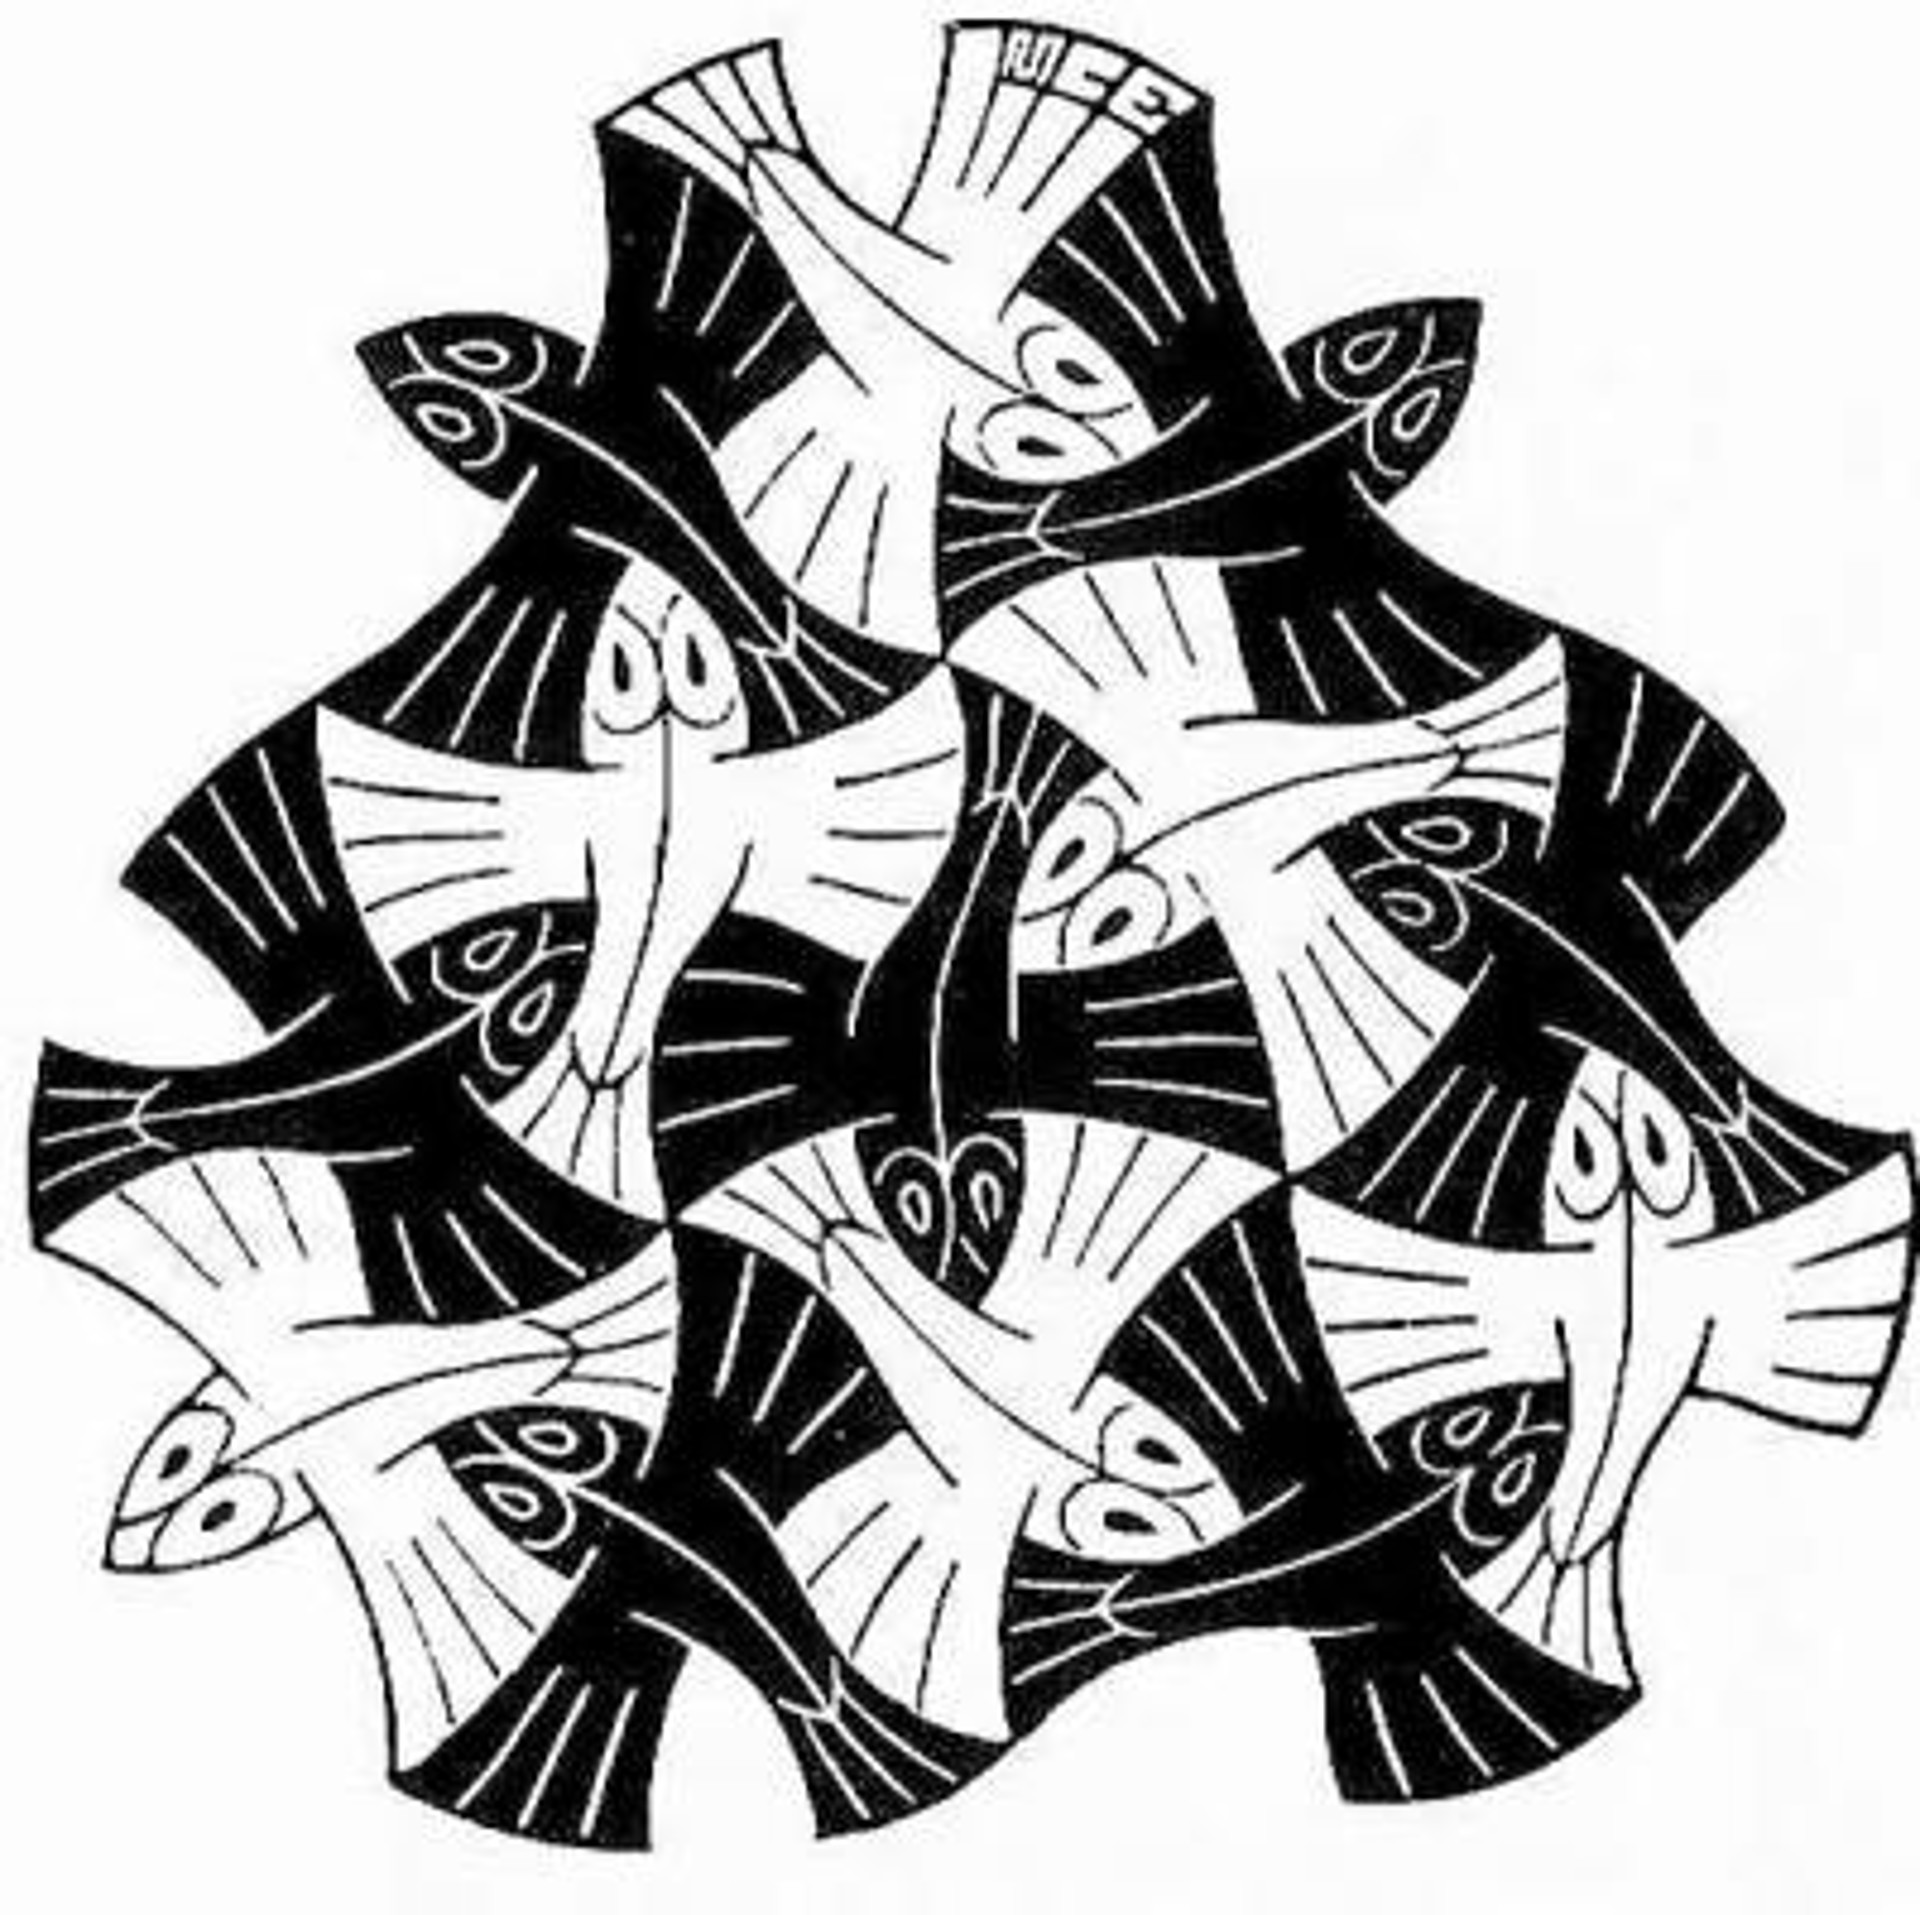 Fish Vignette by M.C. Escher